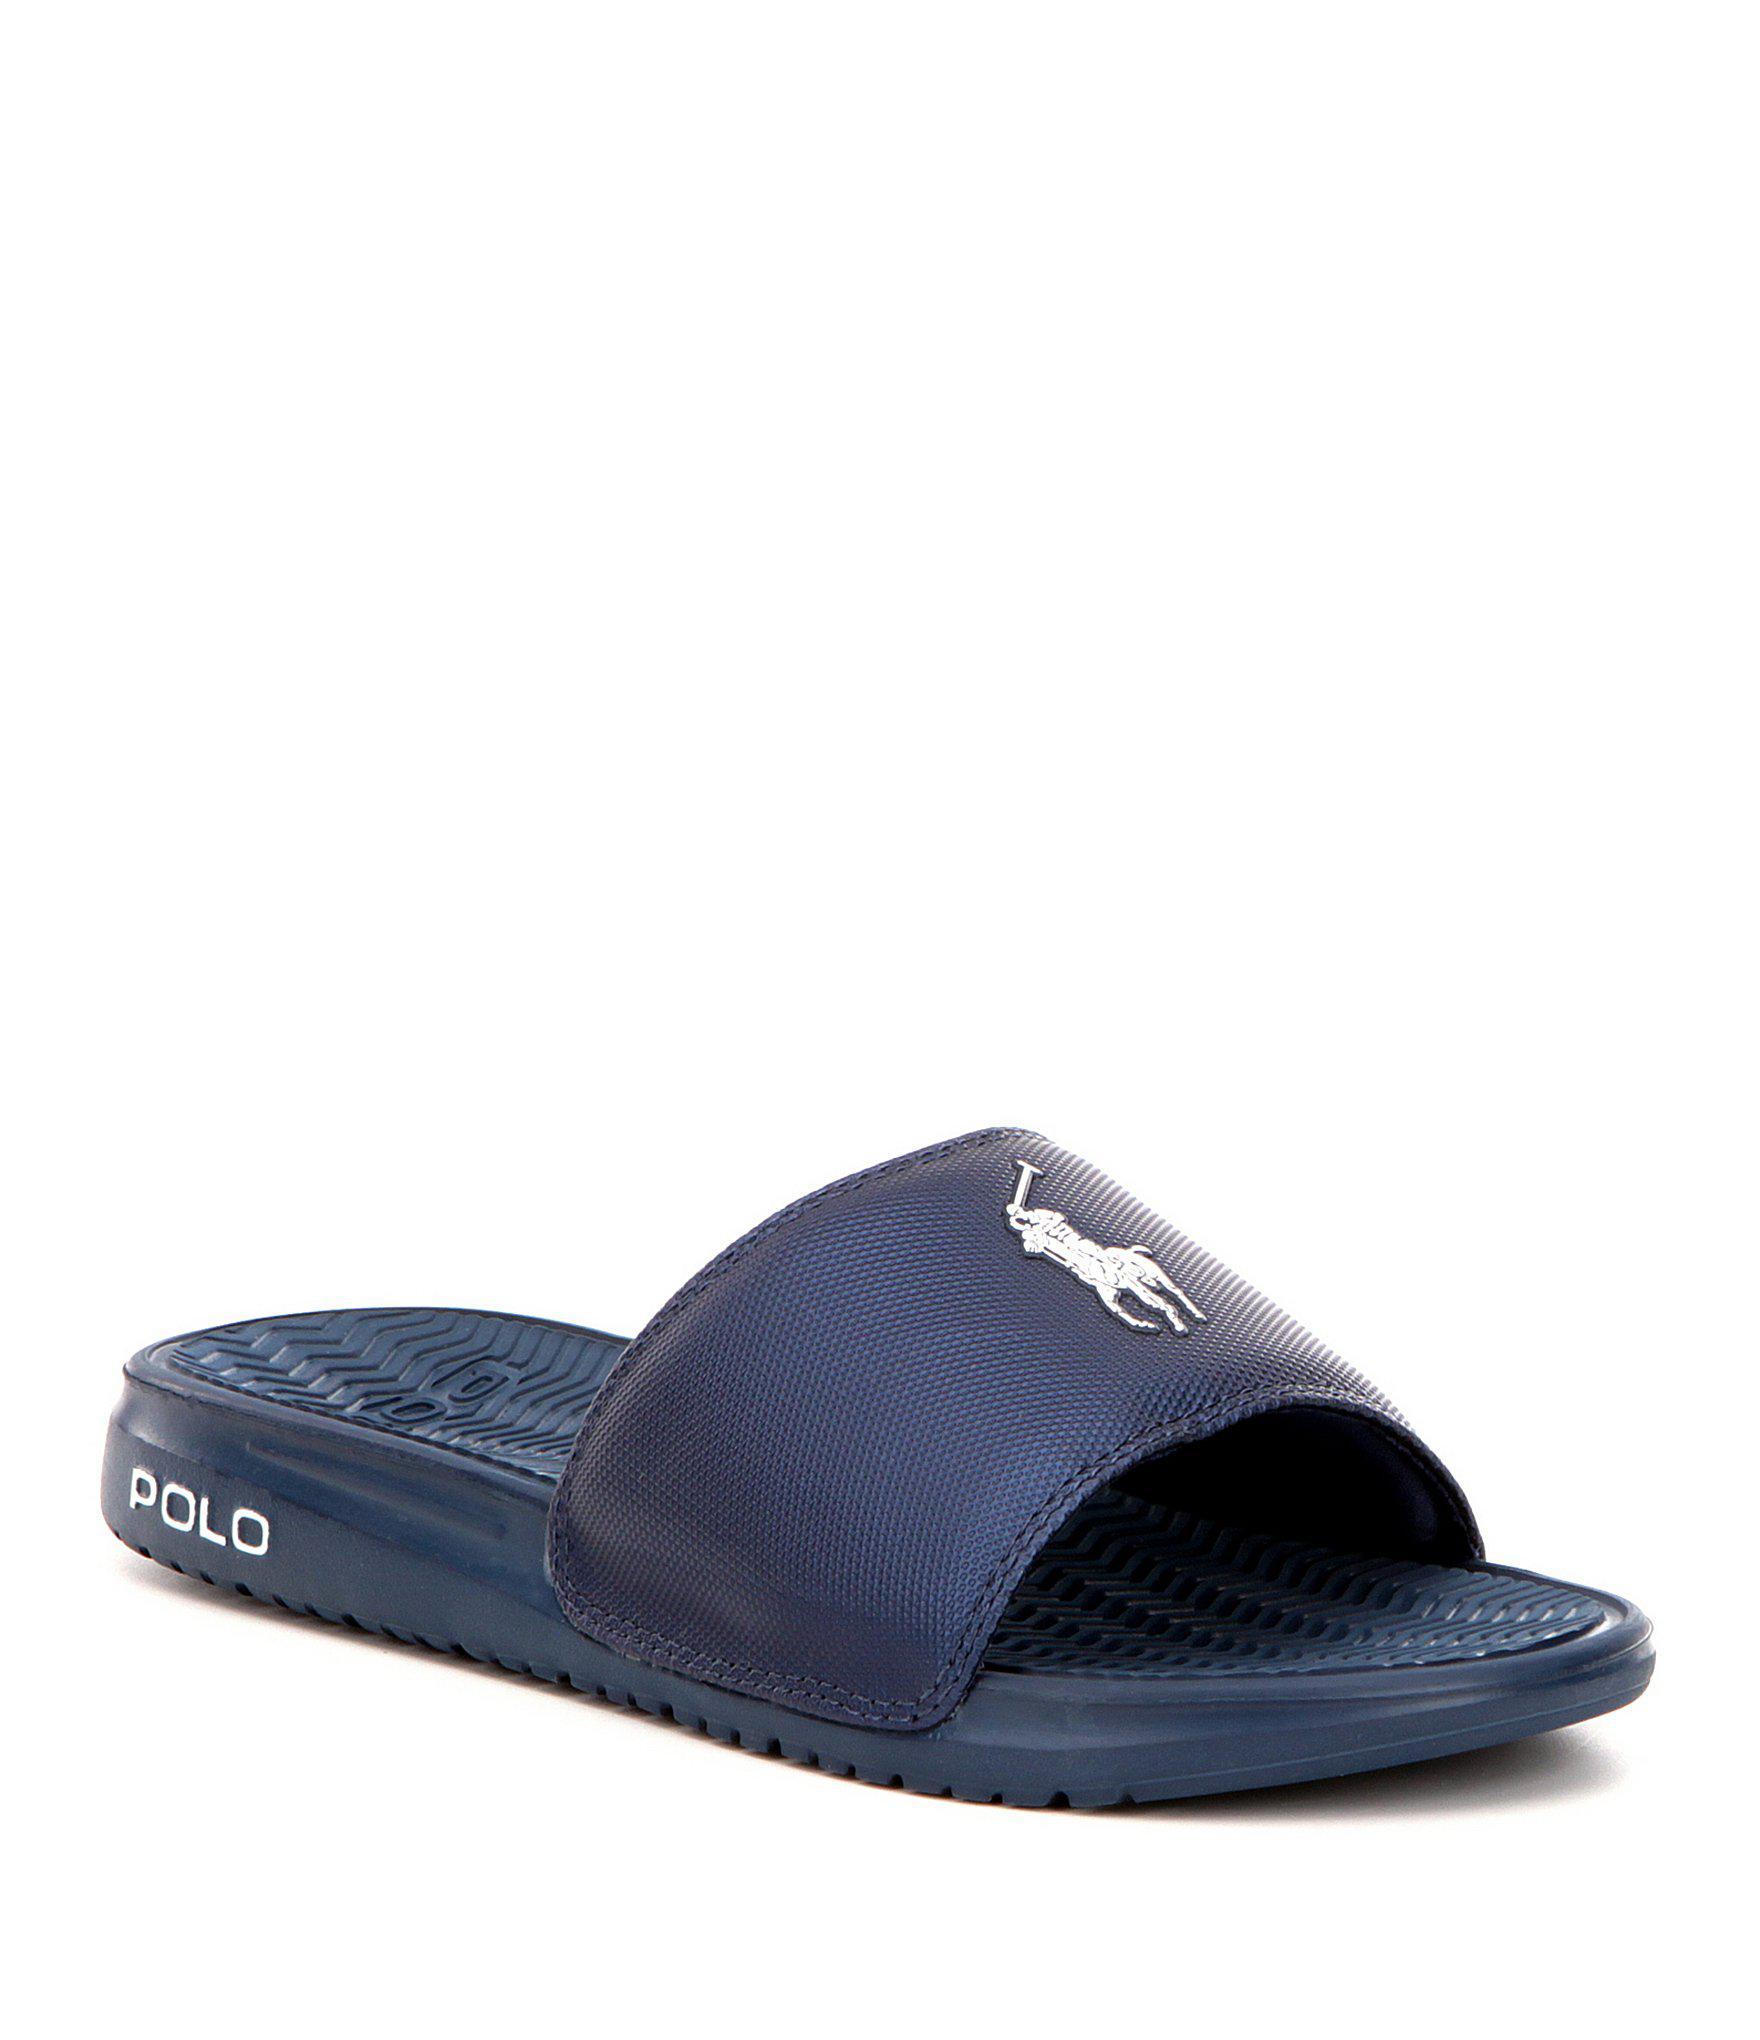 d138e7984d97 Lyst - Polo Ralph Lauren Men ́s Rodwell Slide in Blue for Men - Save 34%